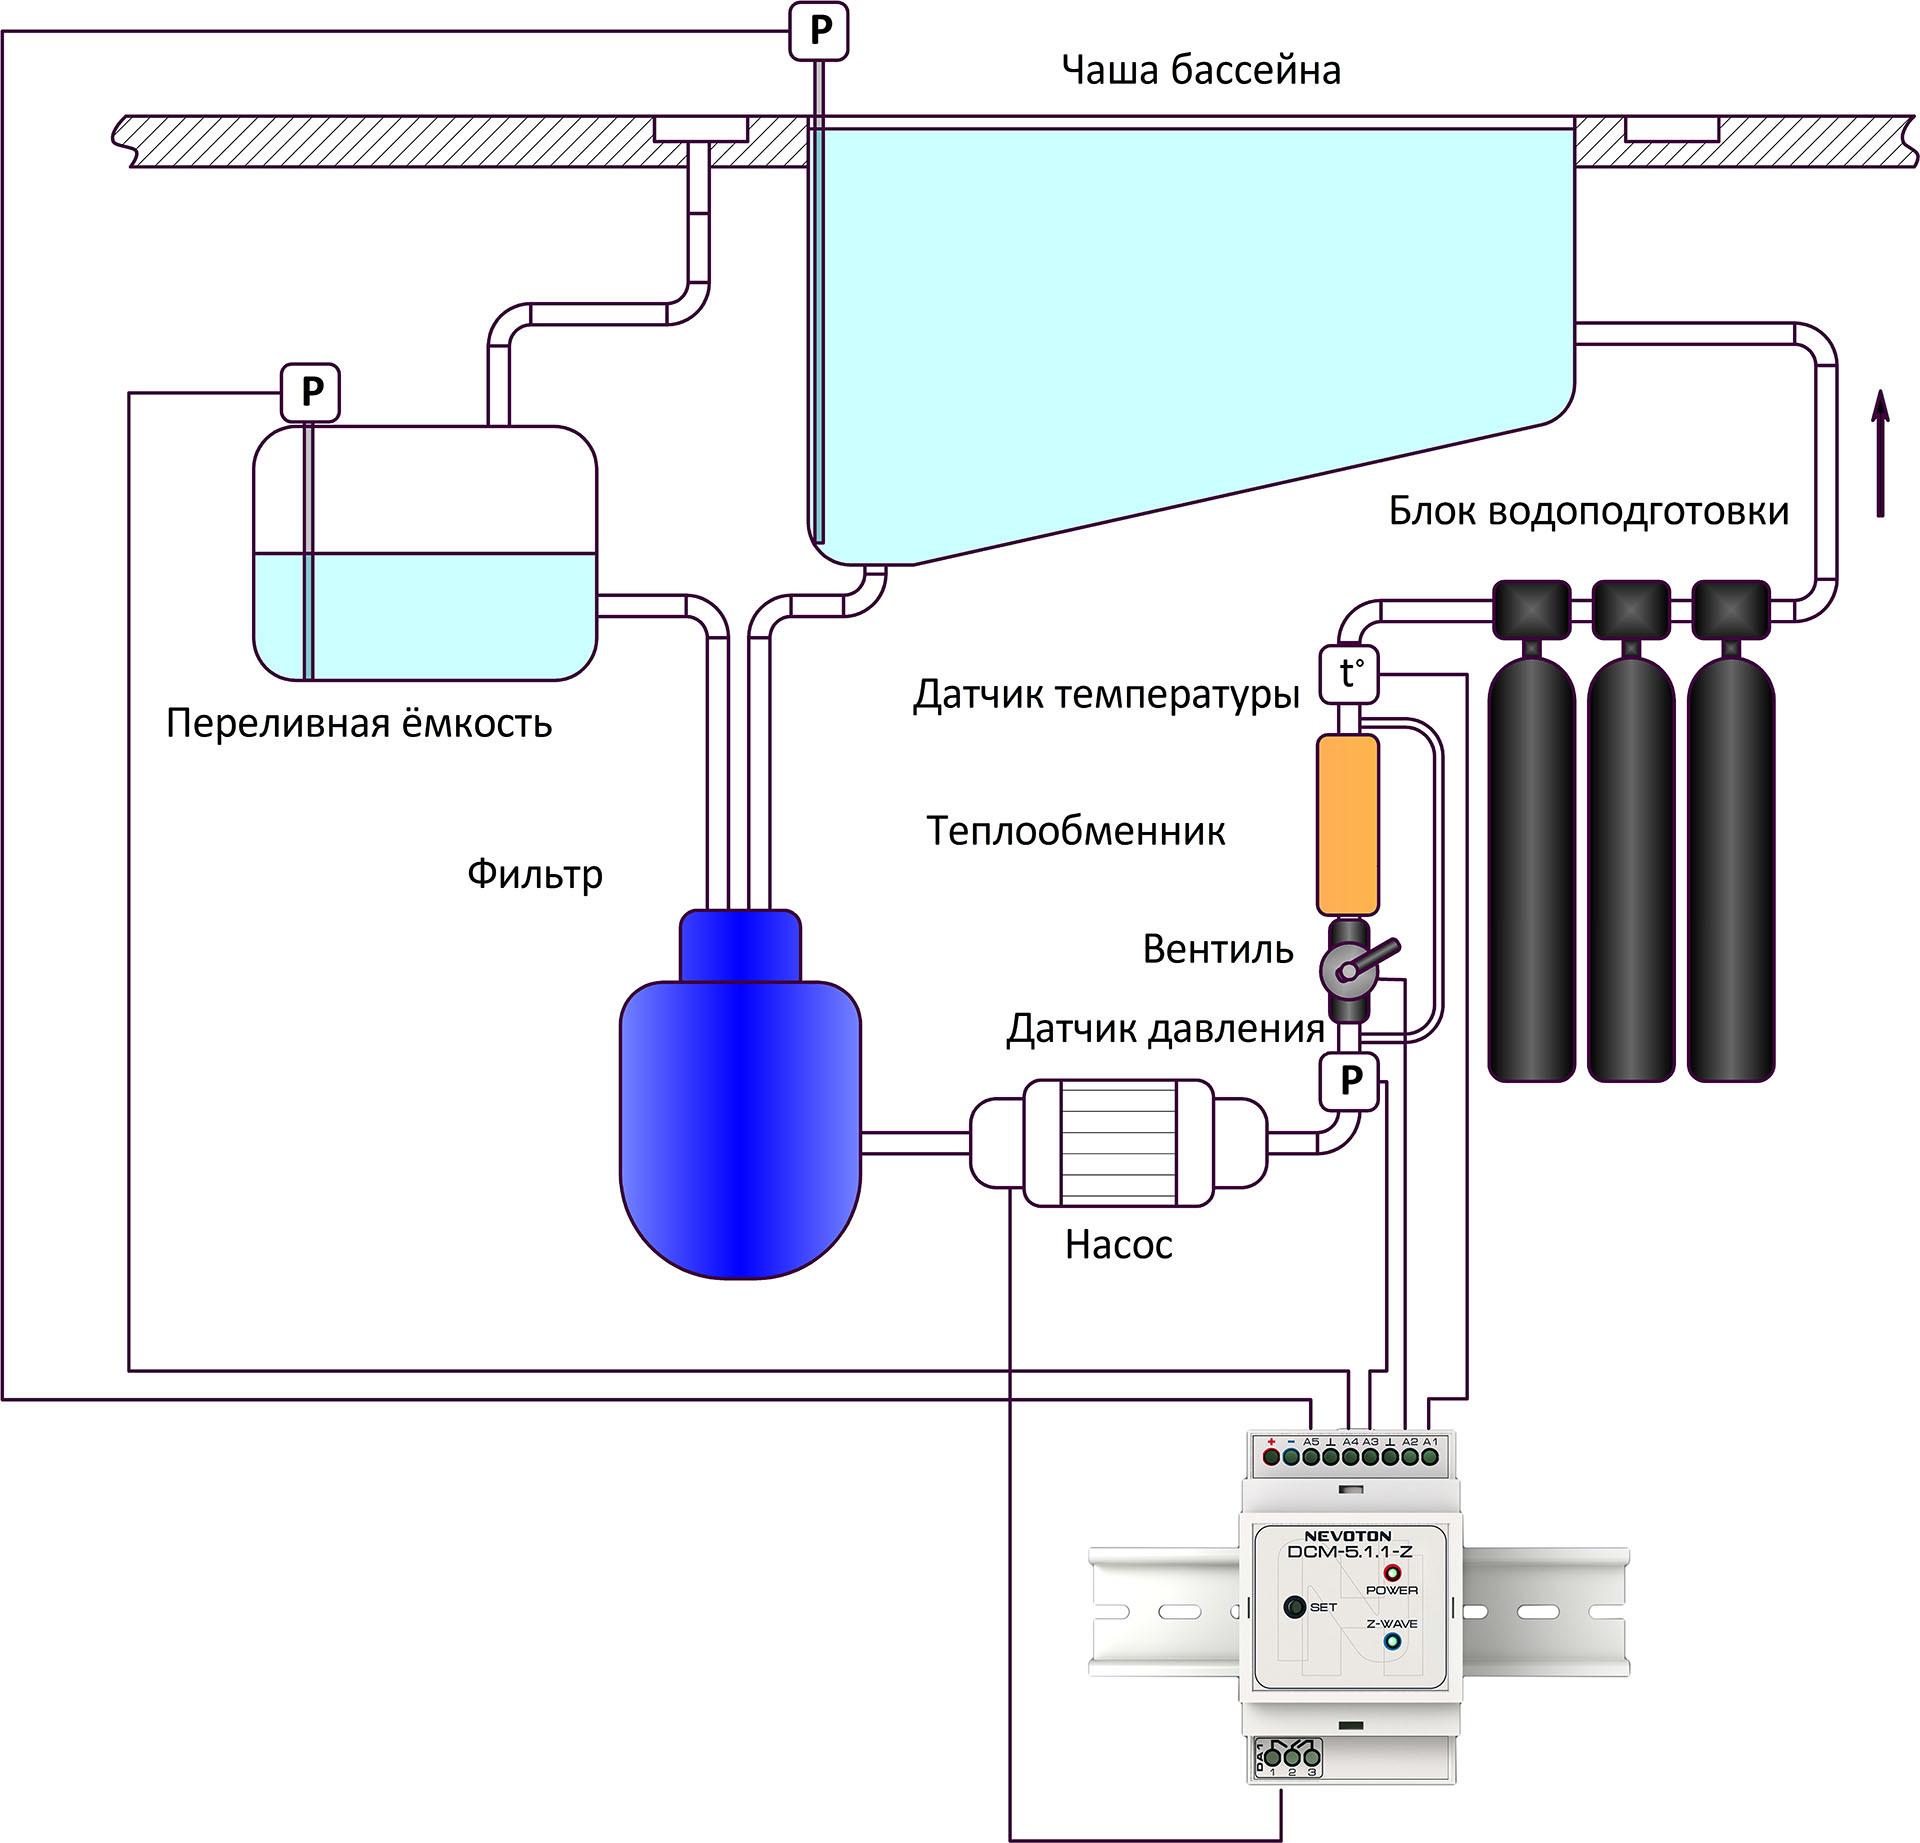 Автоматизация бассейна с модулем сбора данных NEVOTON DMC-5.1.1-Z